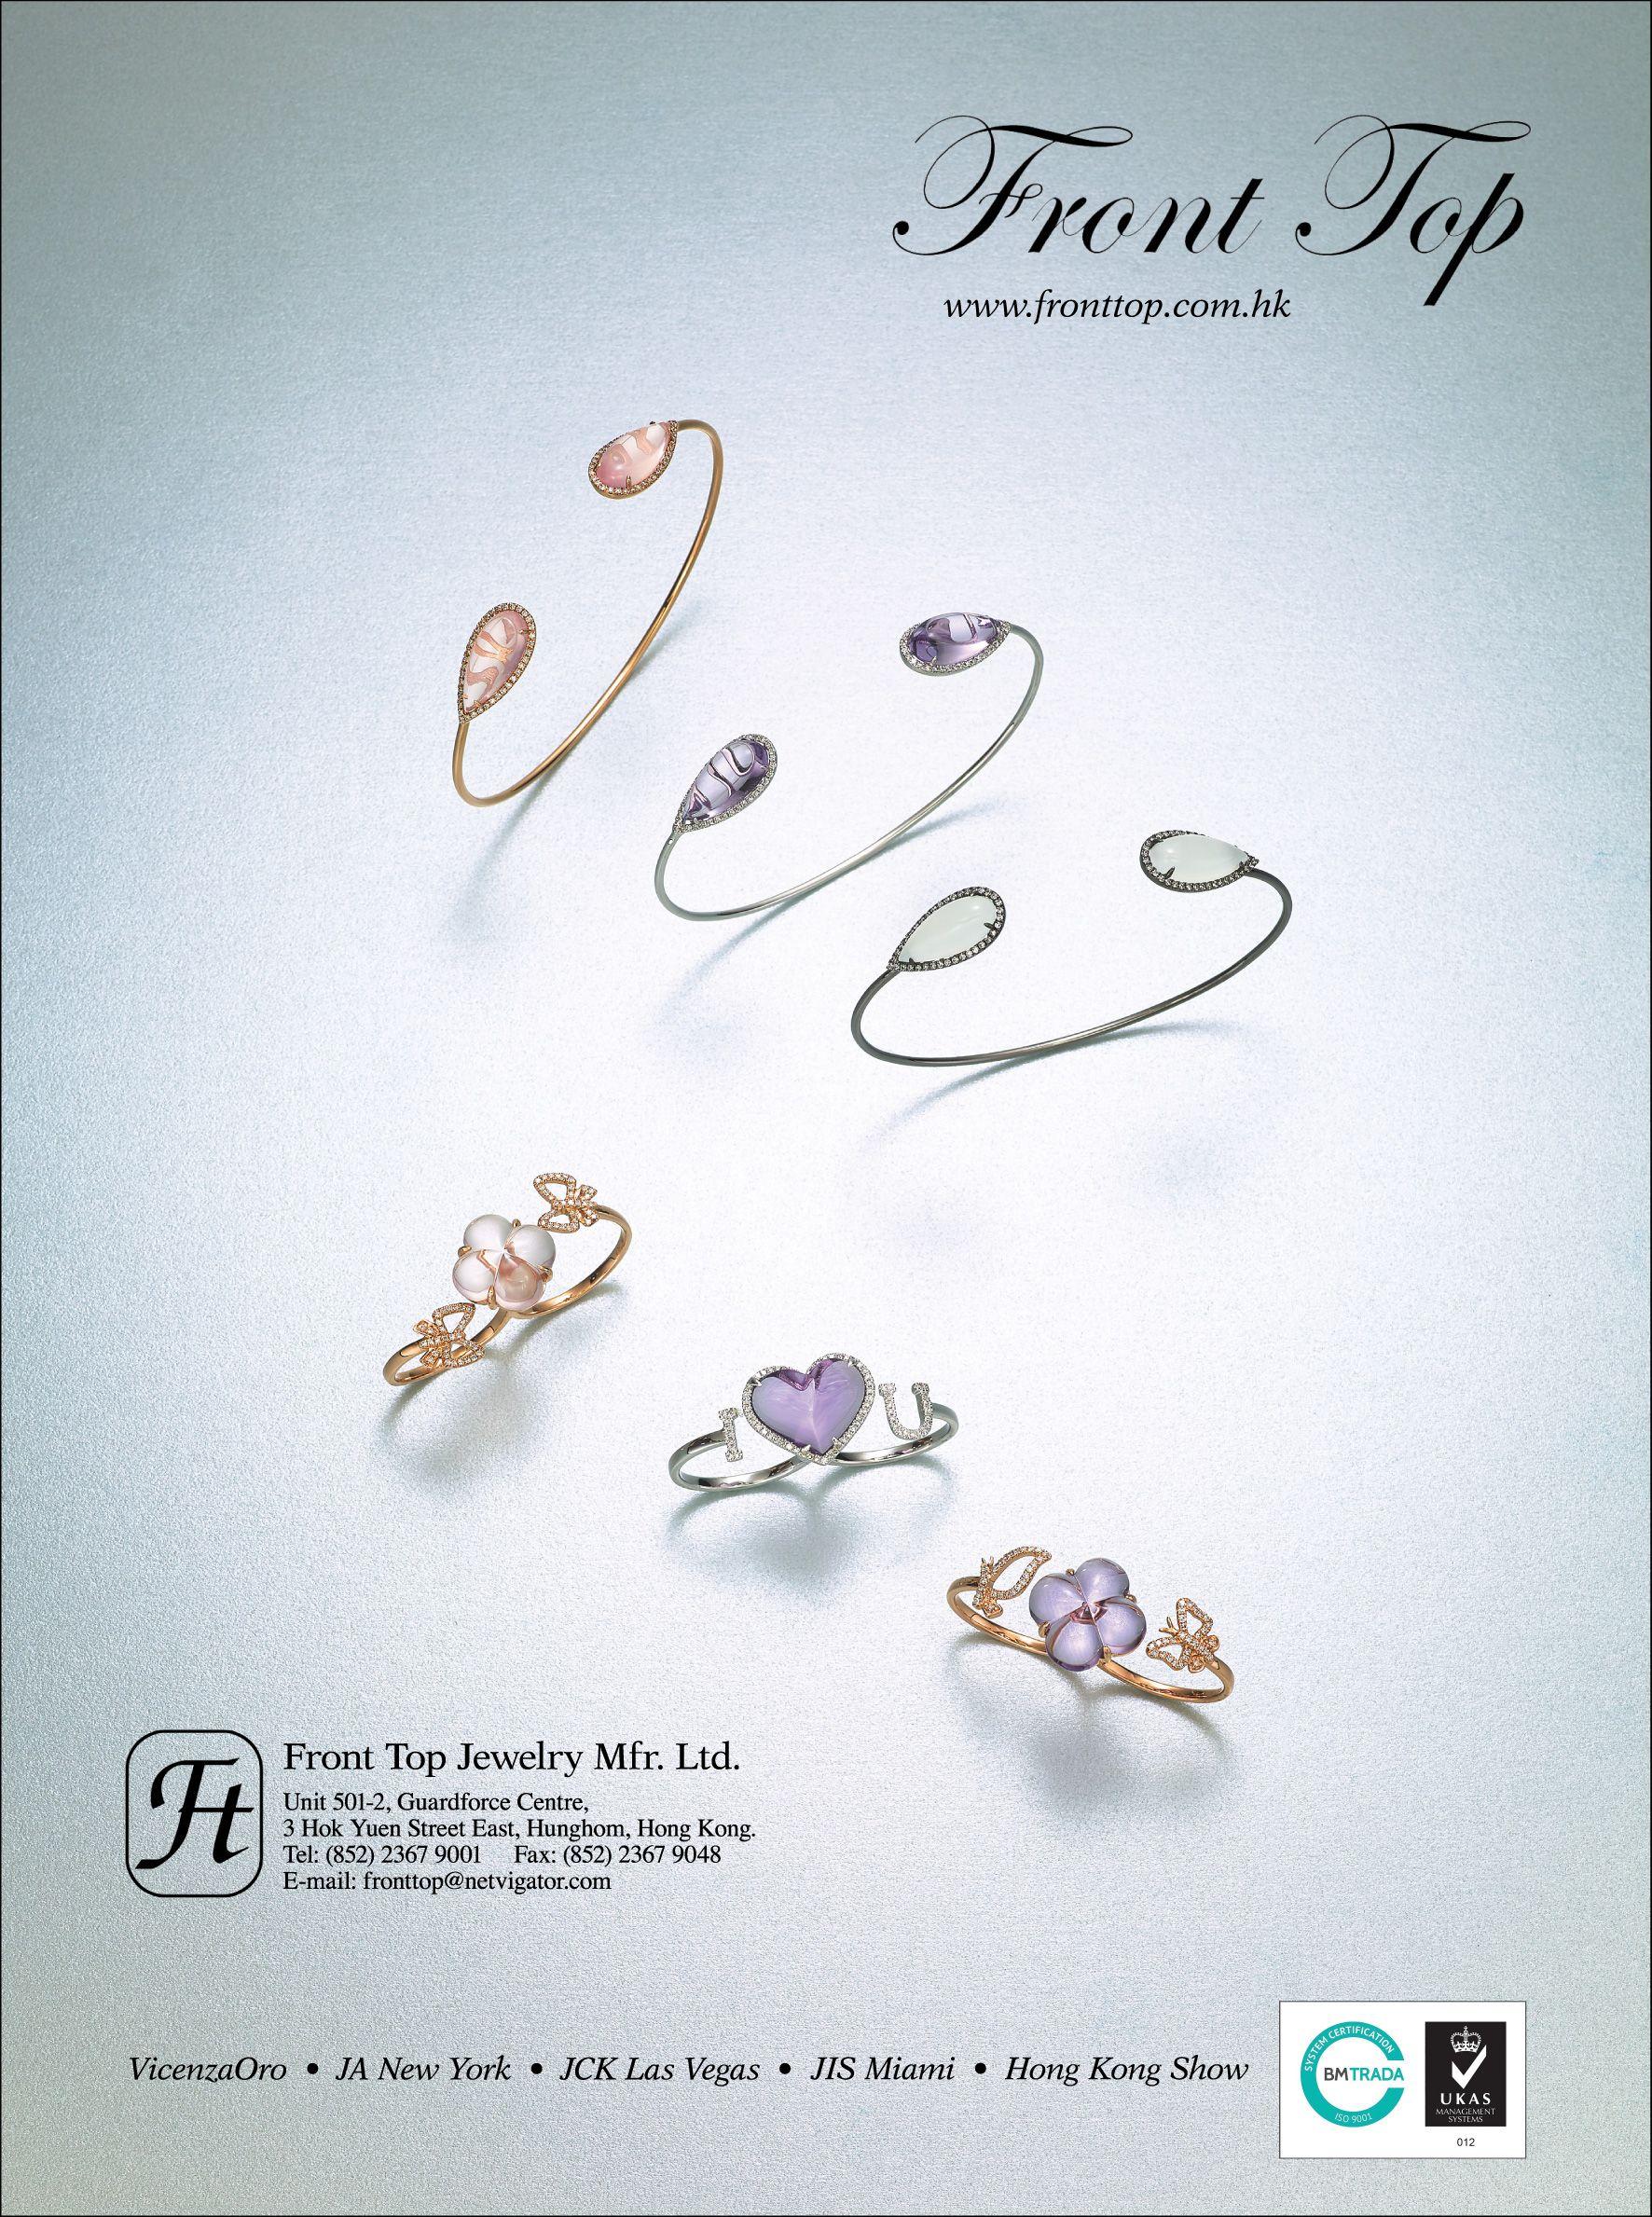 Front Top Jewelry Mfr. Ltd. Booth: 1CE7 Country: HK #jewelry #jewellery #finejewelry #jewelryart #jewelryshow #diamond #gemstones #hkjewelry #jewelryhk #jewelryoftheday #fashion #trend #vibes #goodvibes #wearable #stylish #inspiration #art #artistic #crafts #craftsmanship #design #jewelrydesign